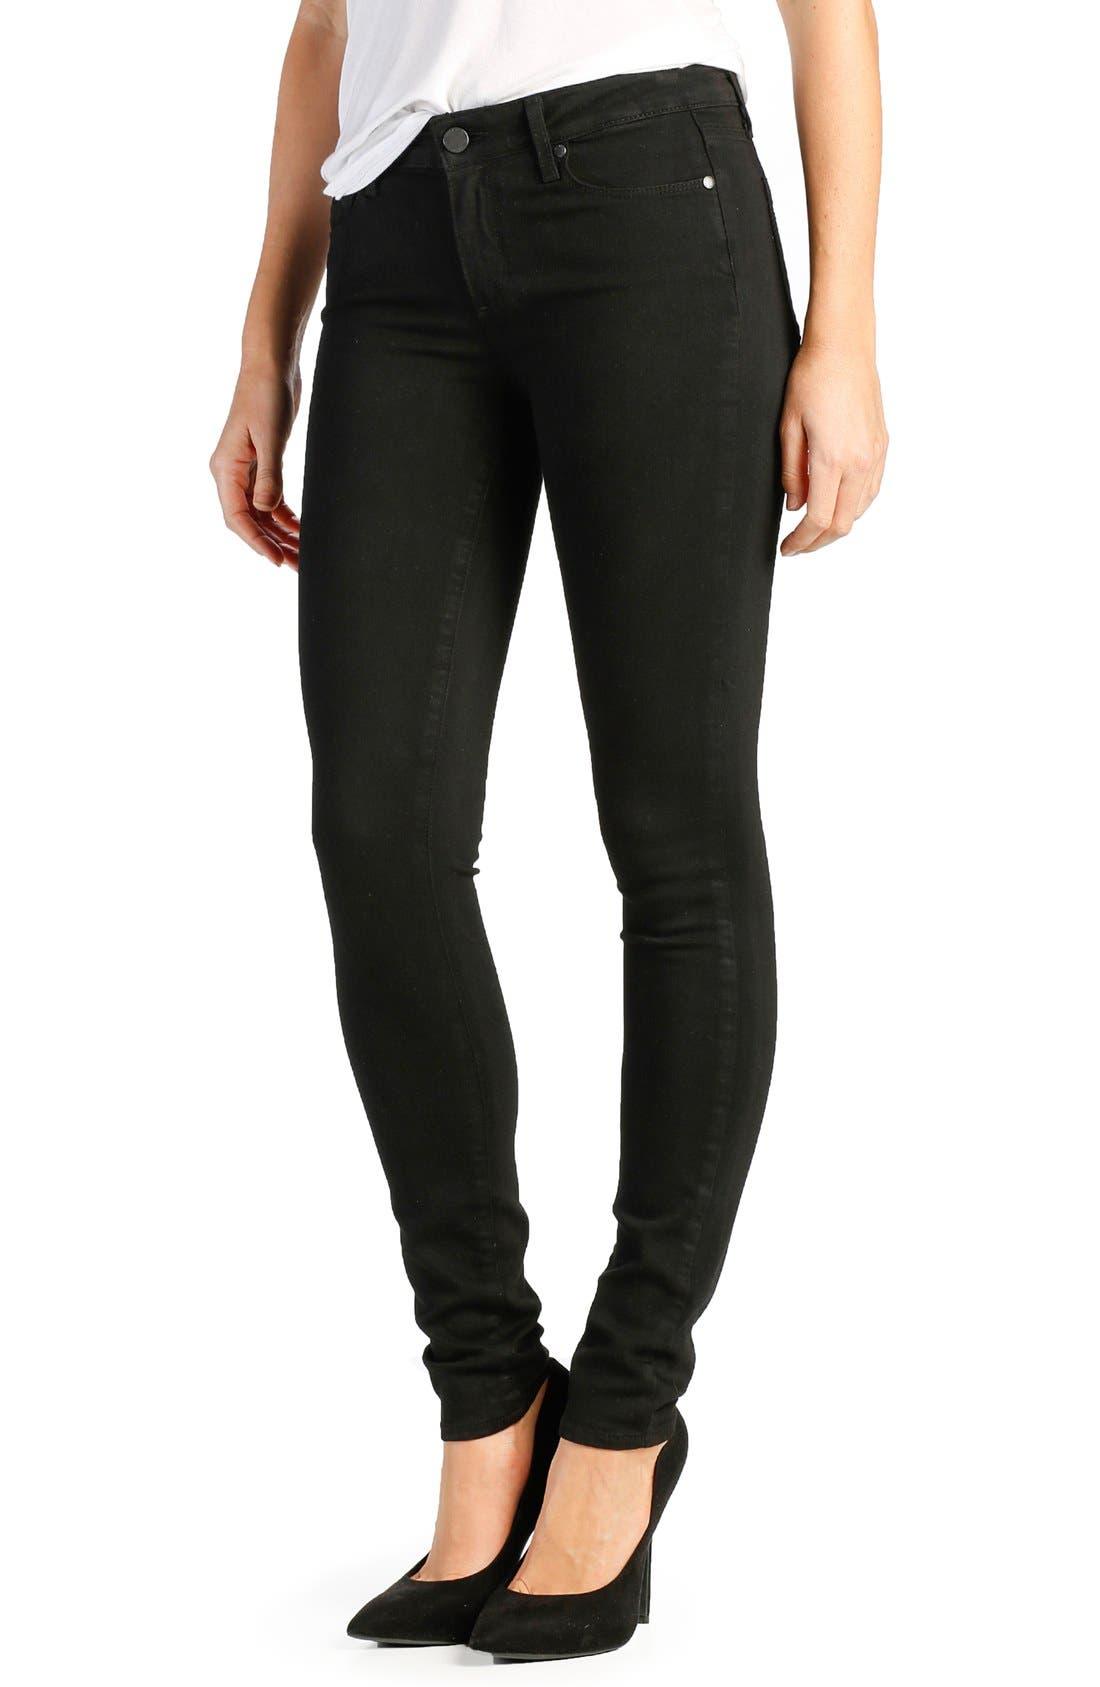 PAIGE Transcend -Leggy Ultra Skinny Jeans, Main, color, BLACK SHADOW